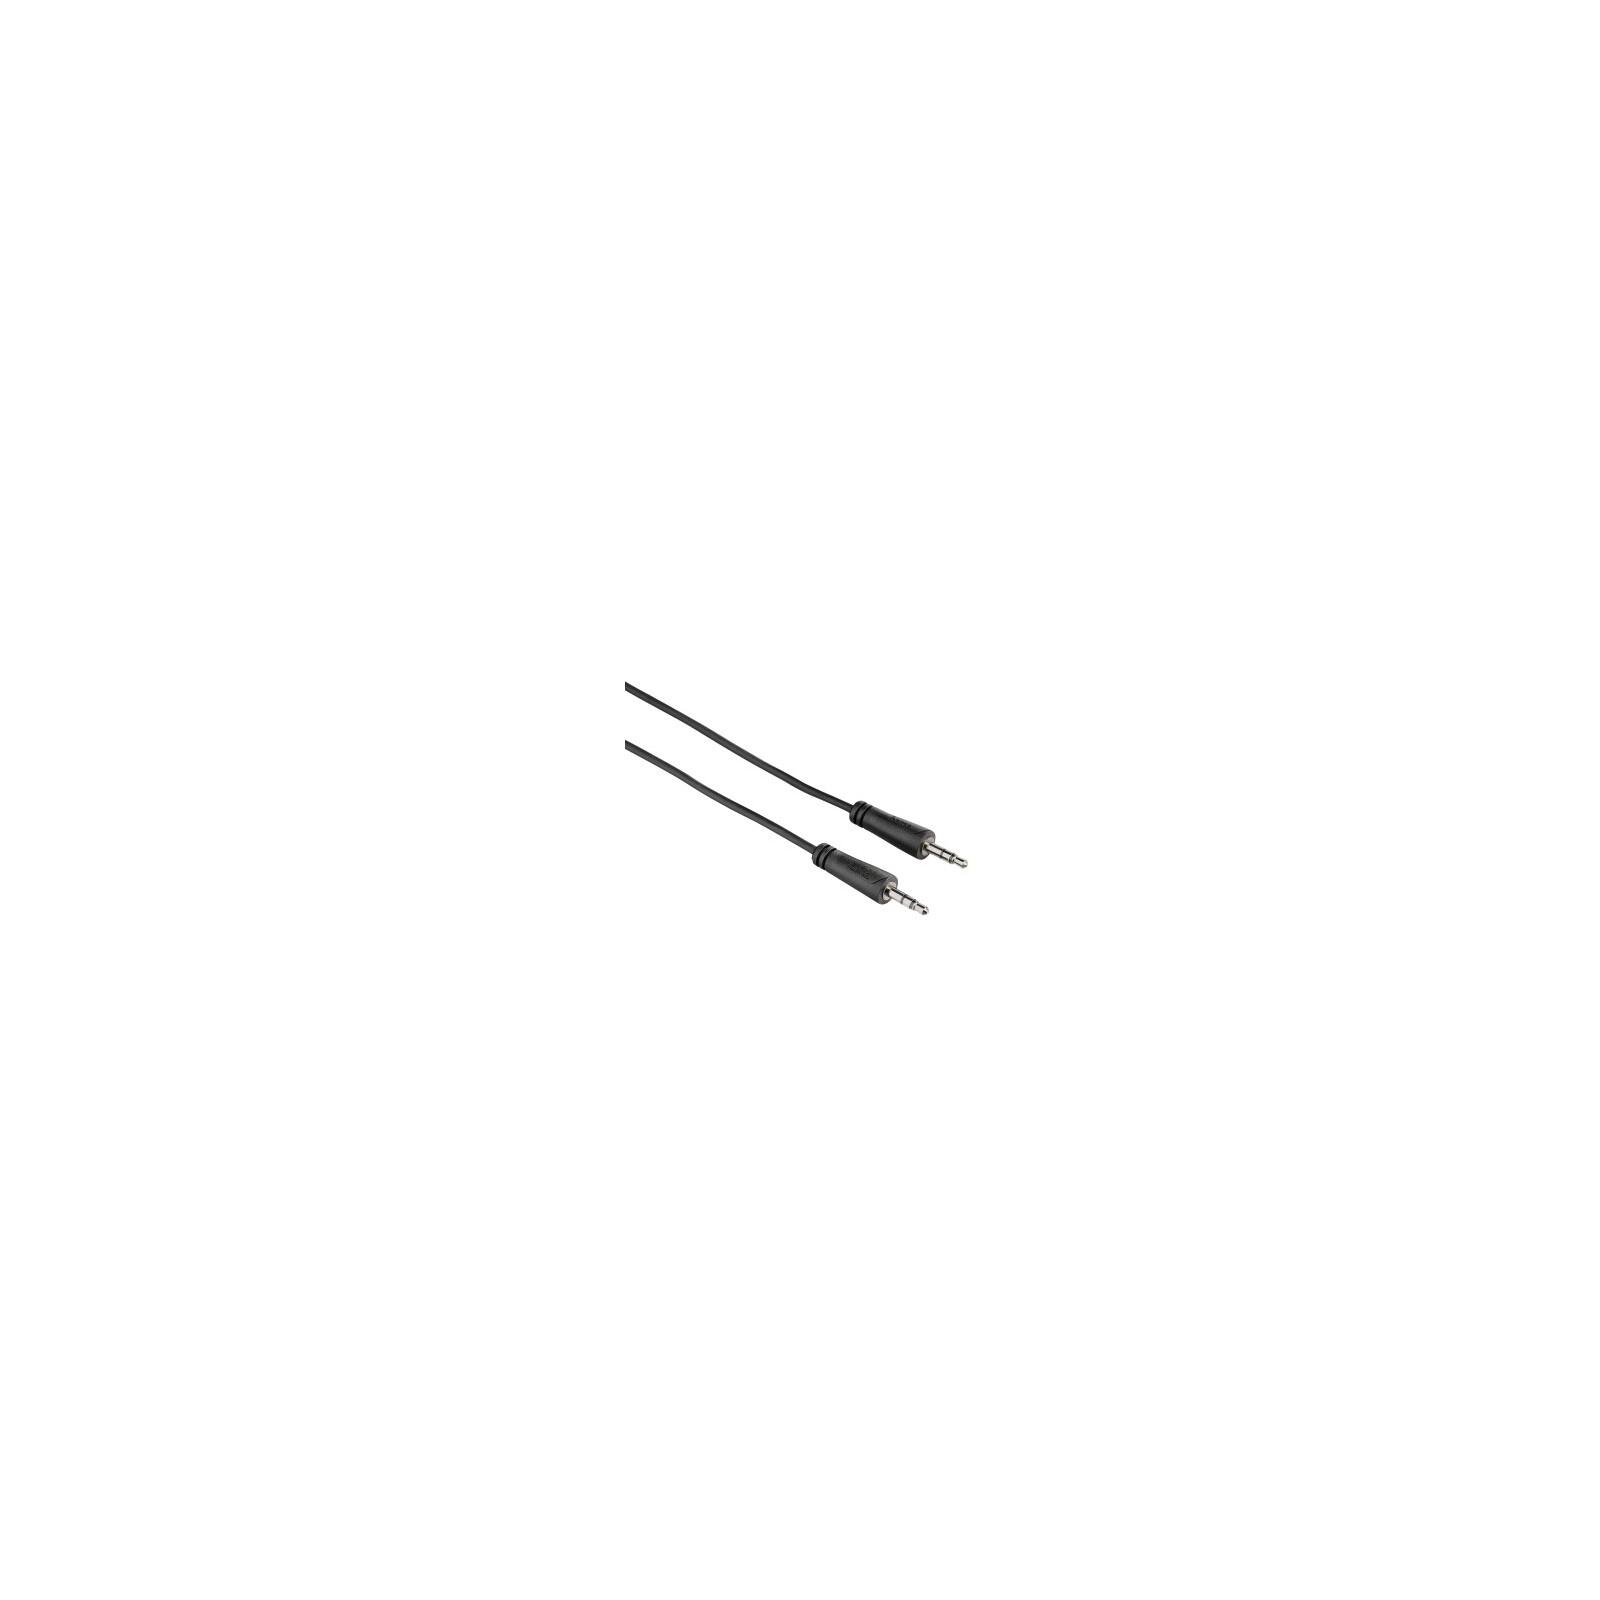 Hama 122309 Audio Kabel 3,5mm Klinken Stecker